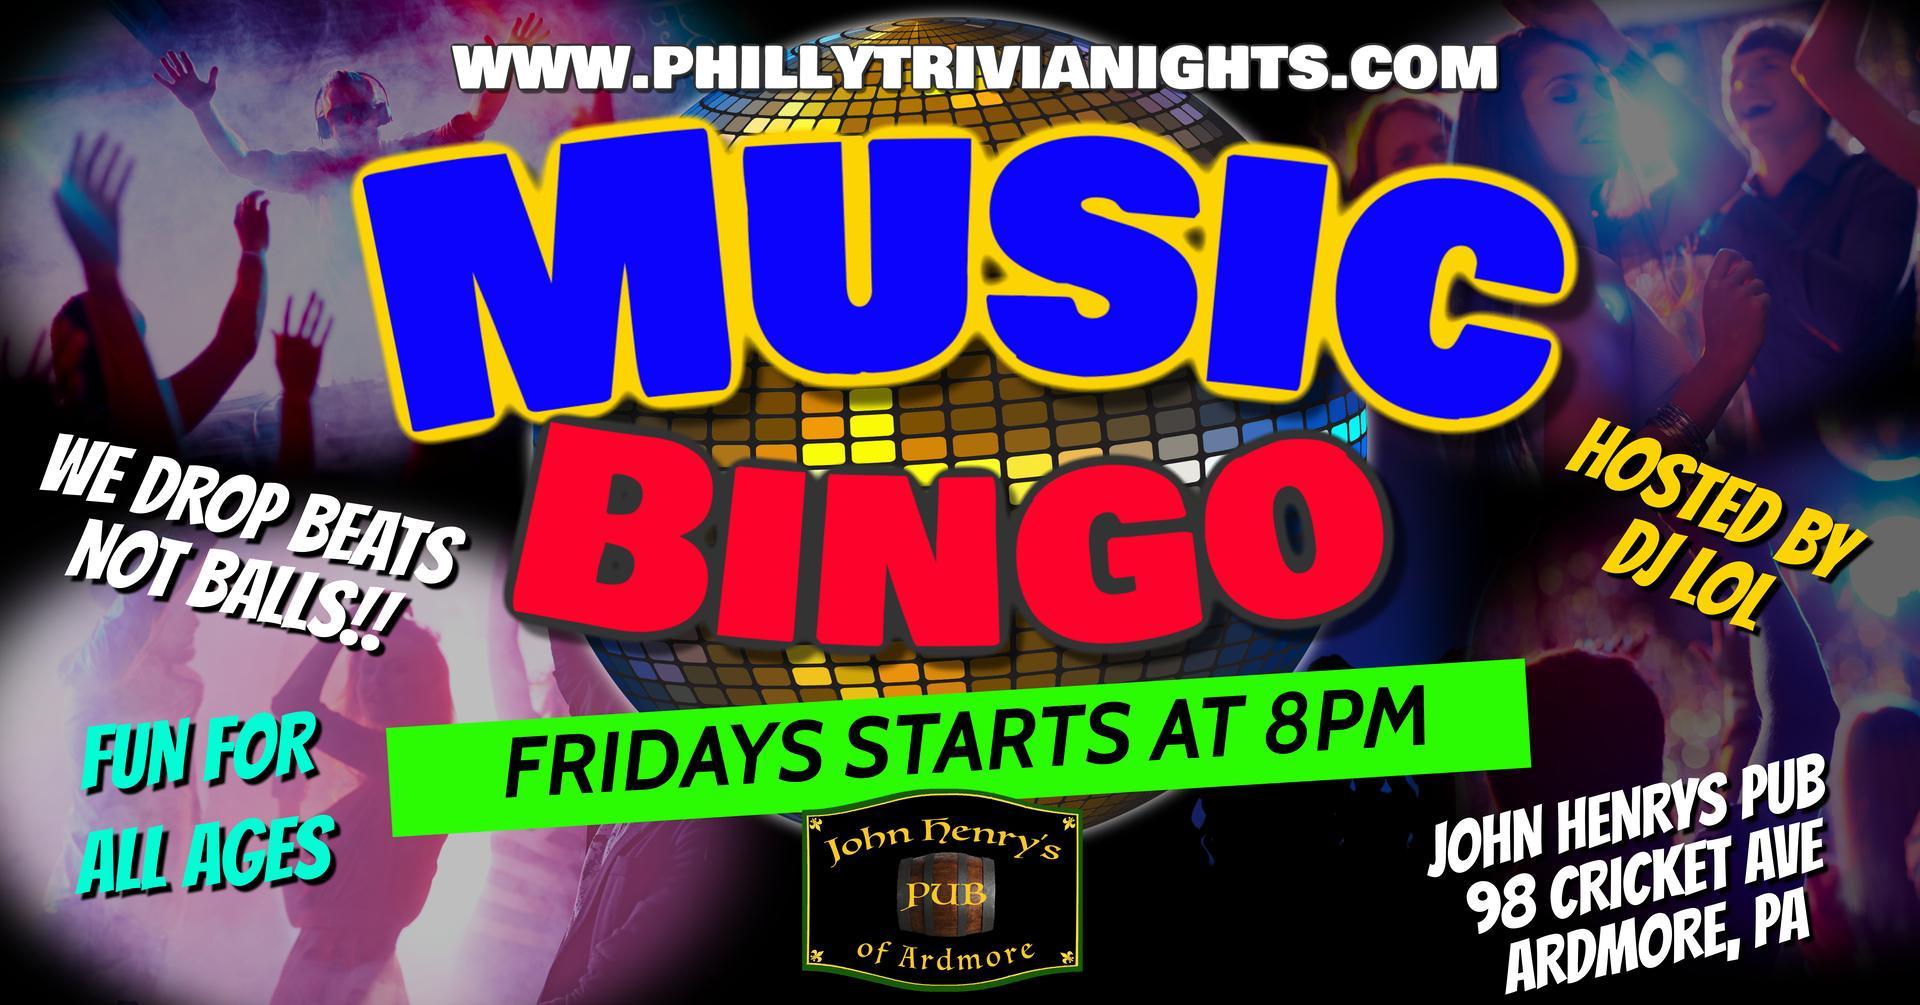 Friday Music Bingo at John Henrys Pub in Ardmore, PA